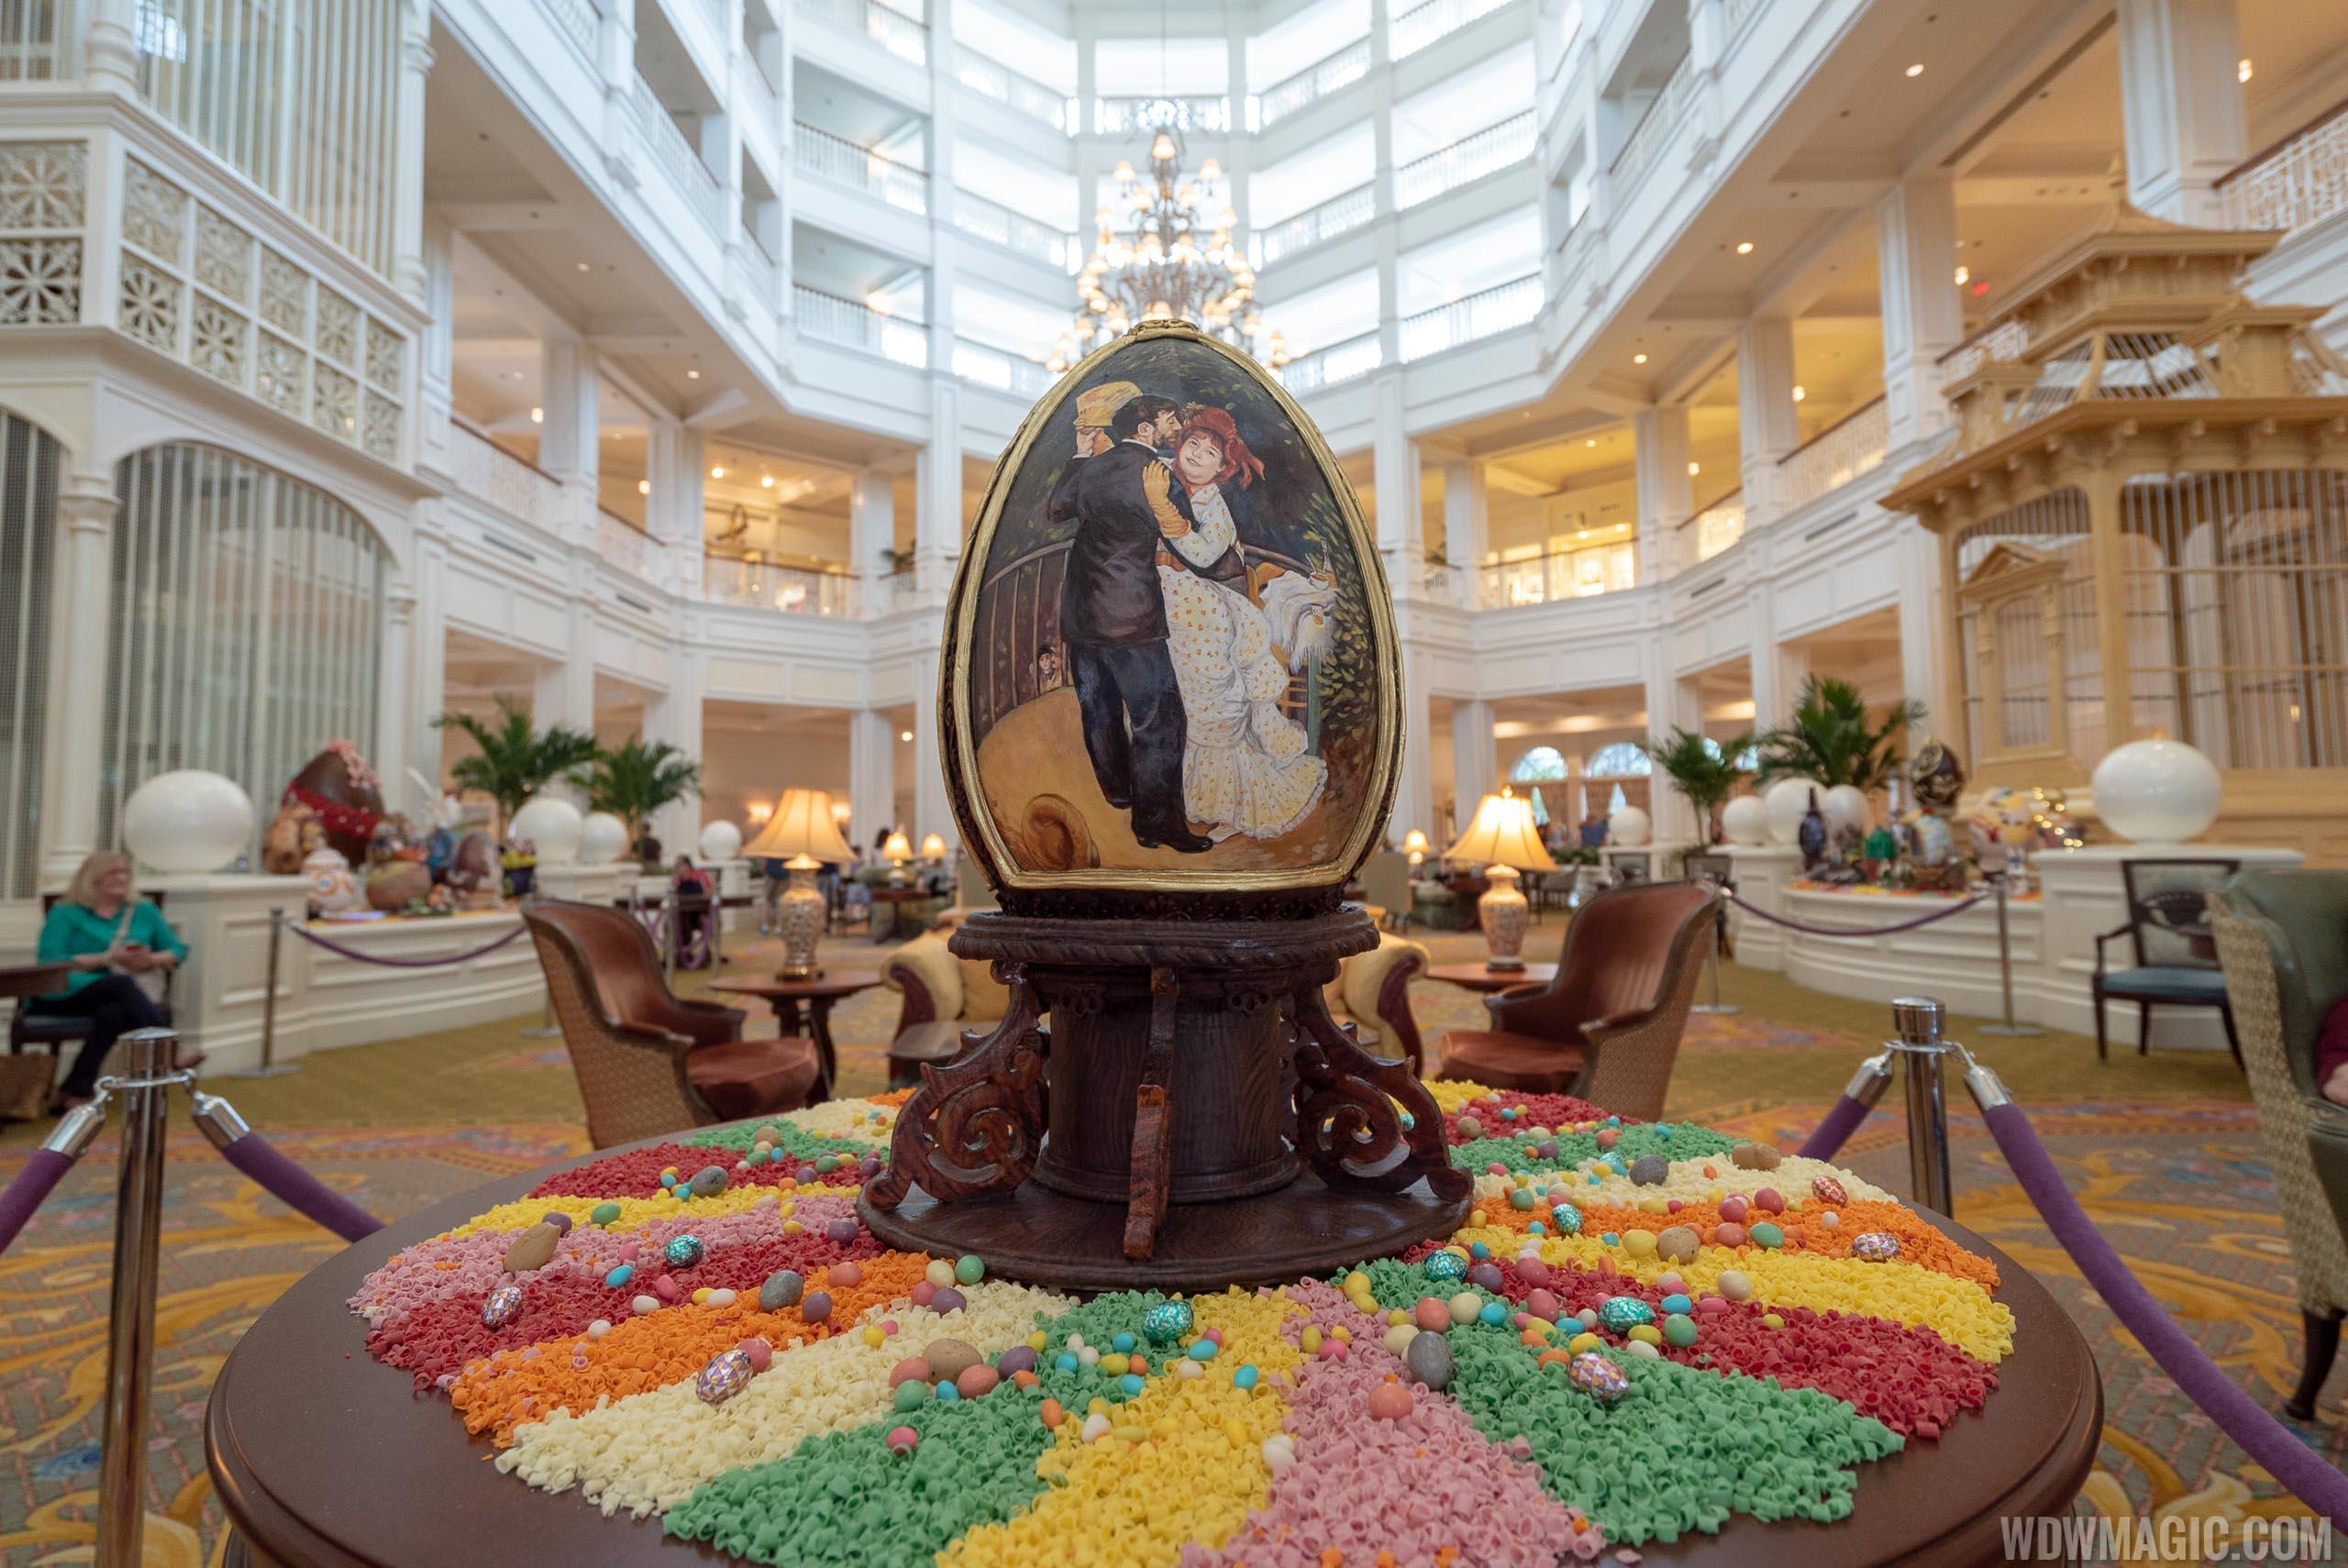 Disney's Grand Floridian Resort and Spa News